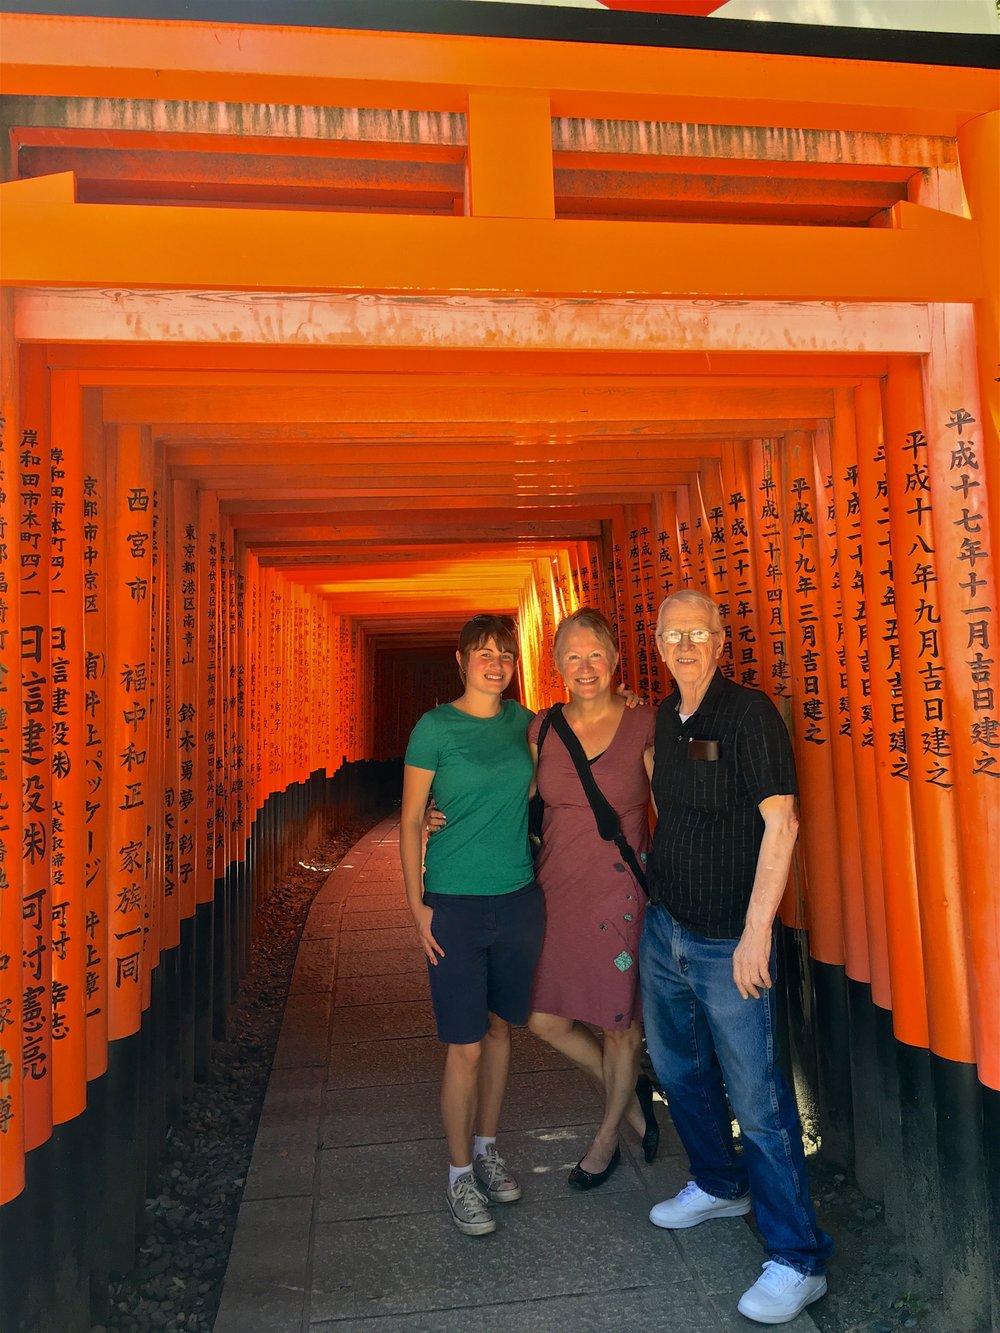 teri_Japan_Kyoto_FushimiInariTaisha_spiritedtable_photo03.jpg